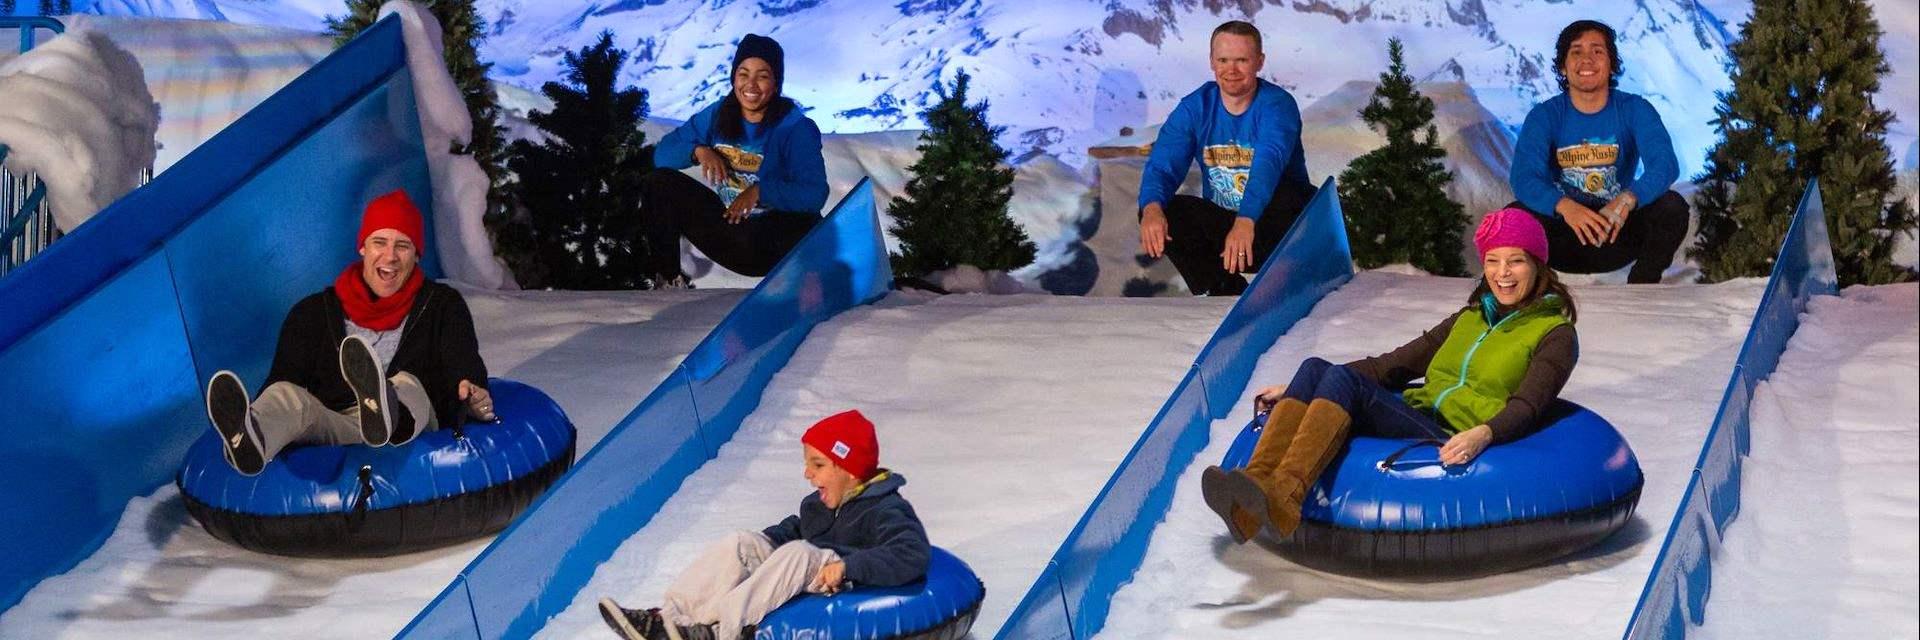 Activities at Christmas Gaylord Palms, New York